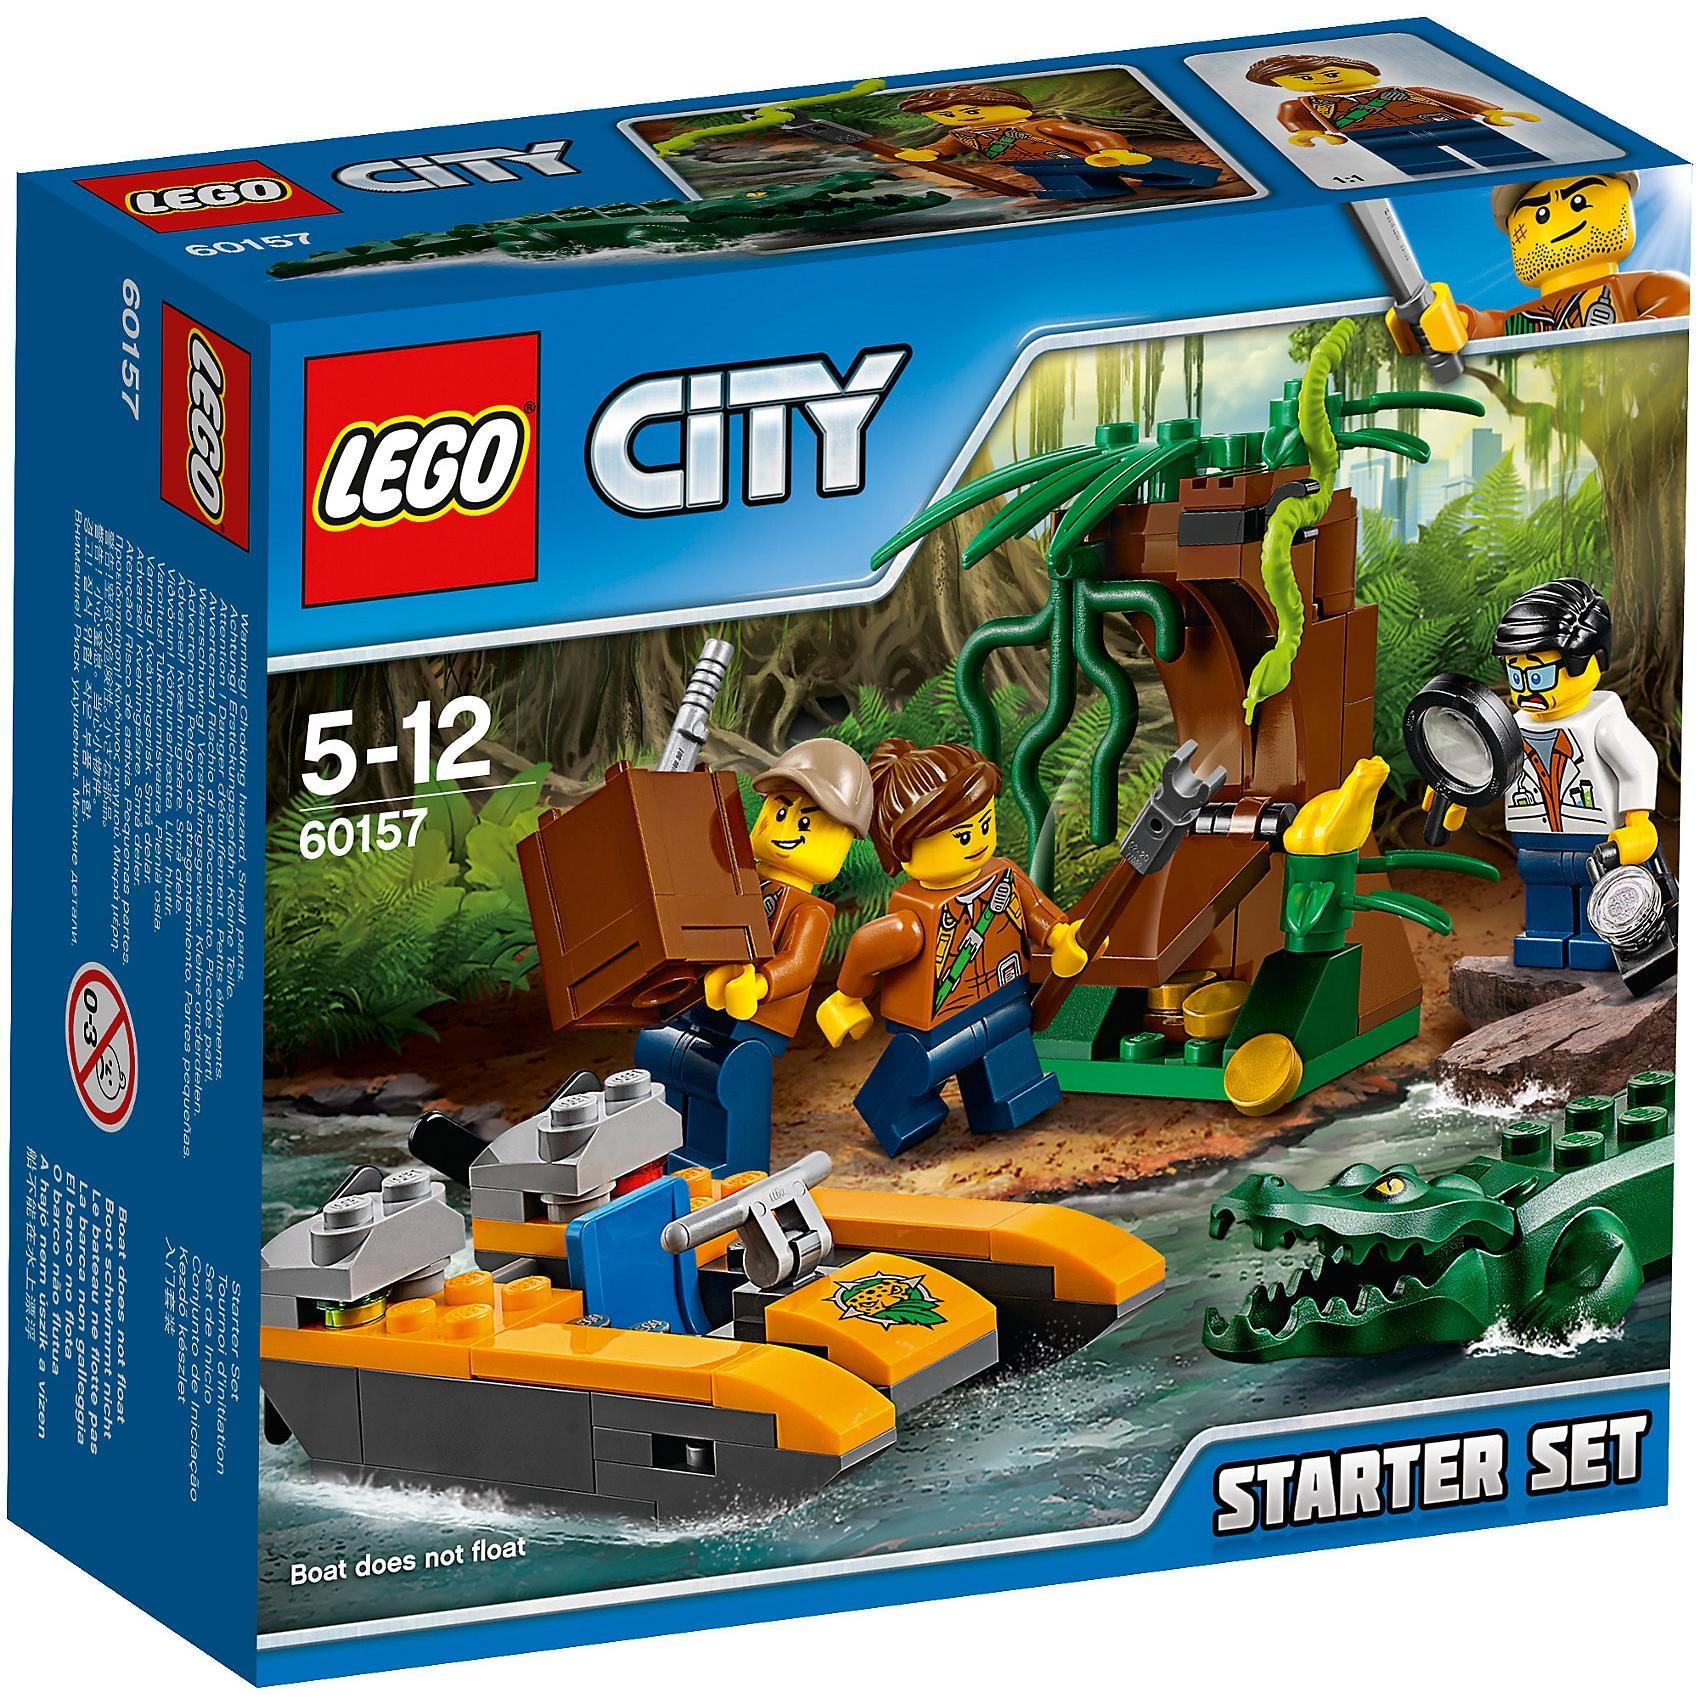 Lego City 60157 Dschungel Starter Set